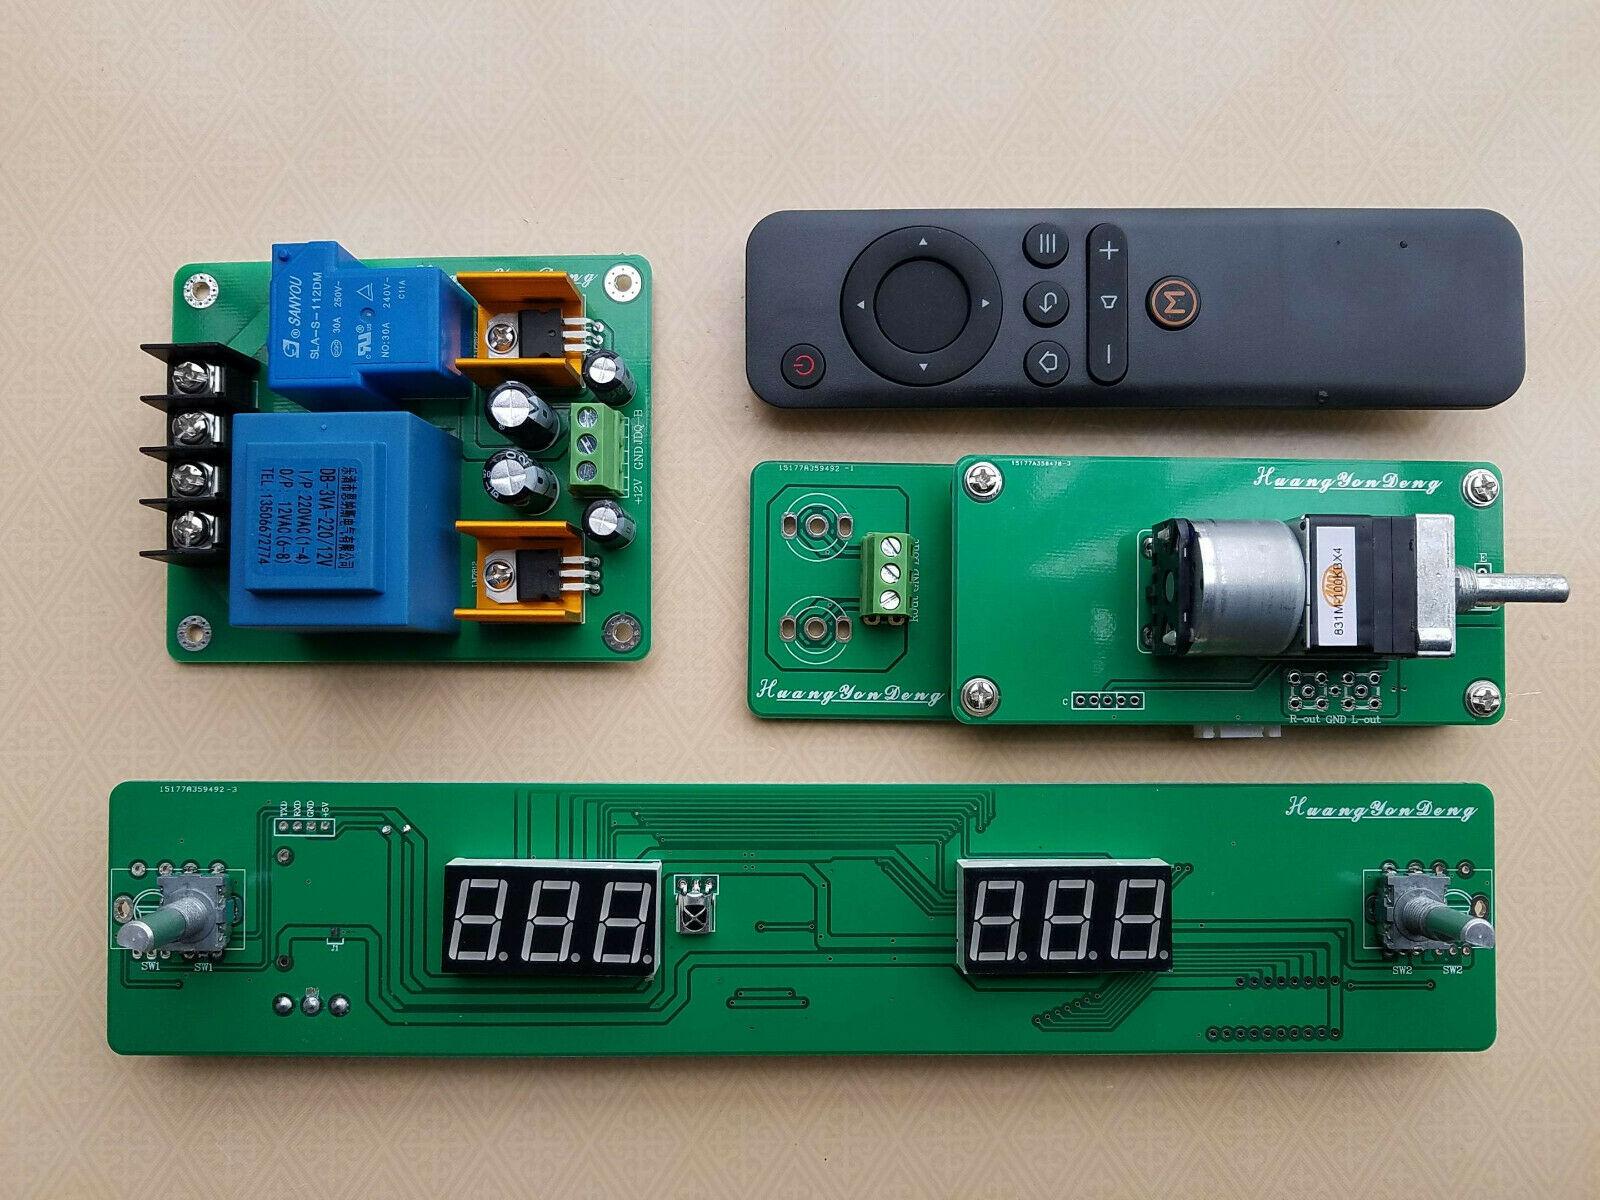 GZLOZONE Hiend ALPS Motor Remote Volume Control Board With Display (4 Way Input) L14-69GZLOZONE Hiend ALPS Motor Remote Volume Control Board With Display (4 Way Input) L14-69